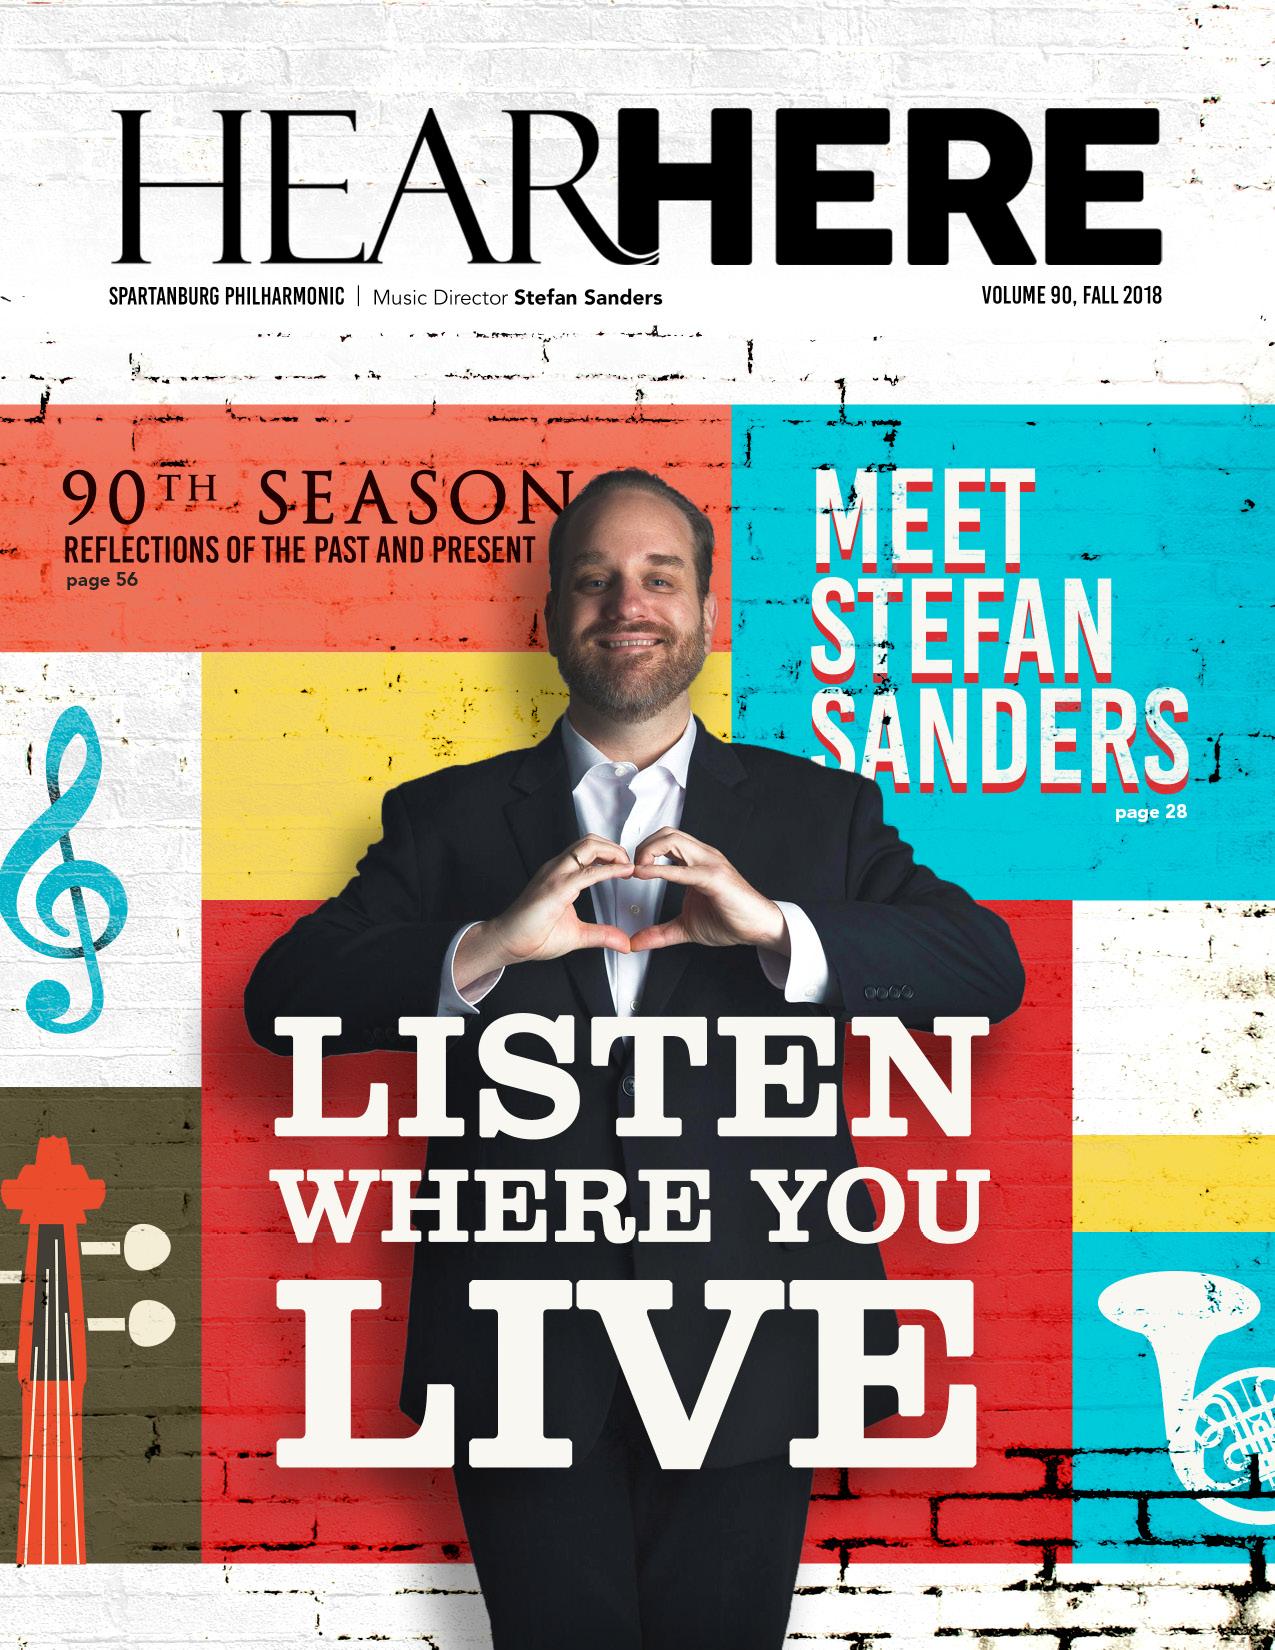 HearHere Program Fall 2018 Cover.jpg